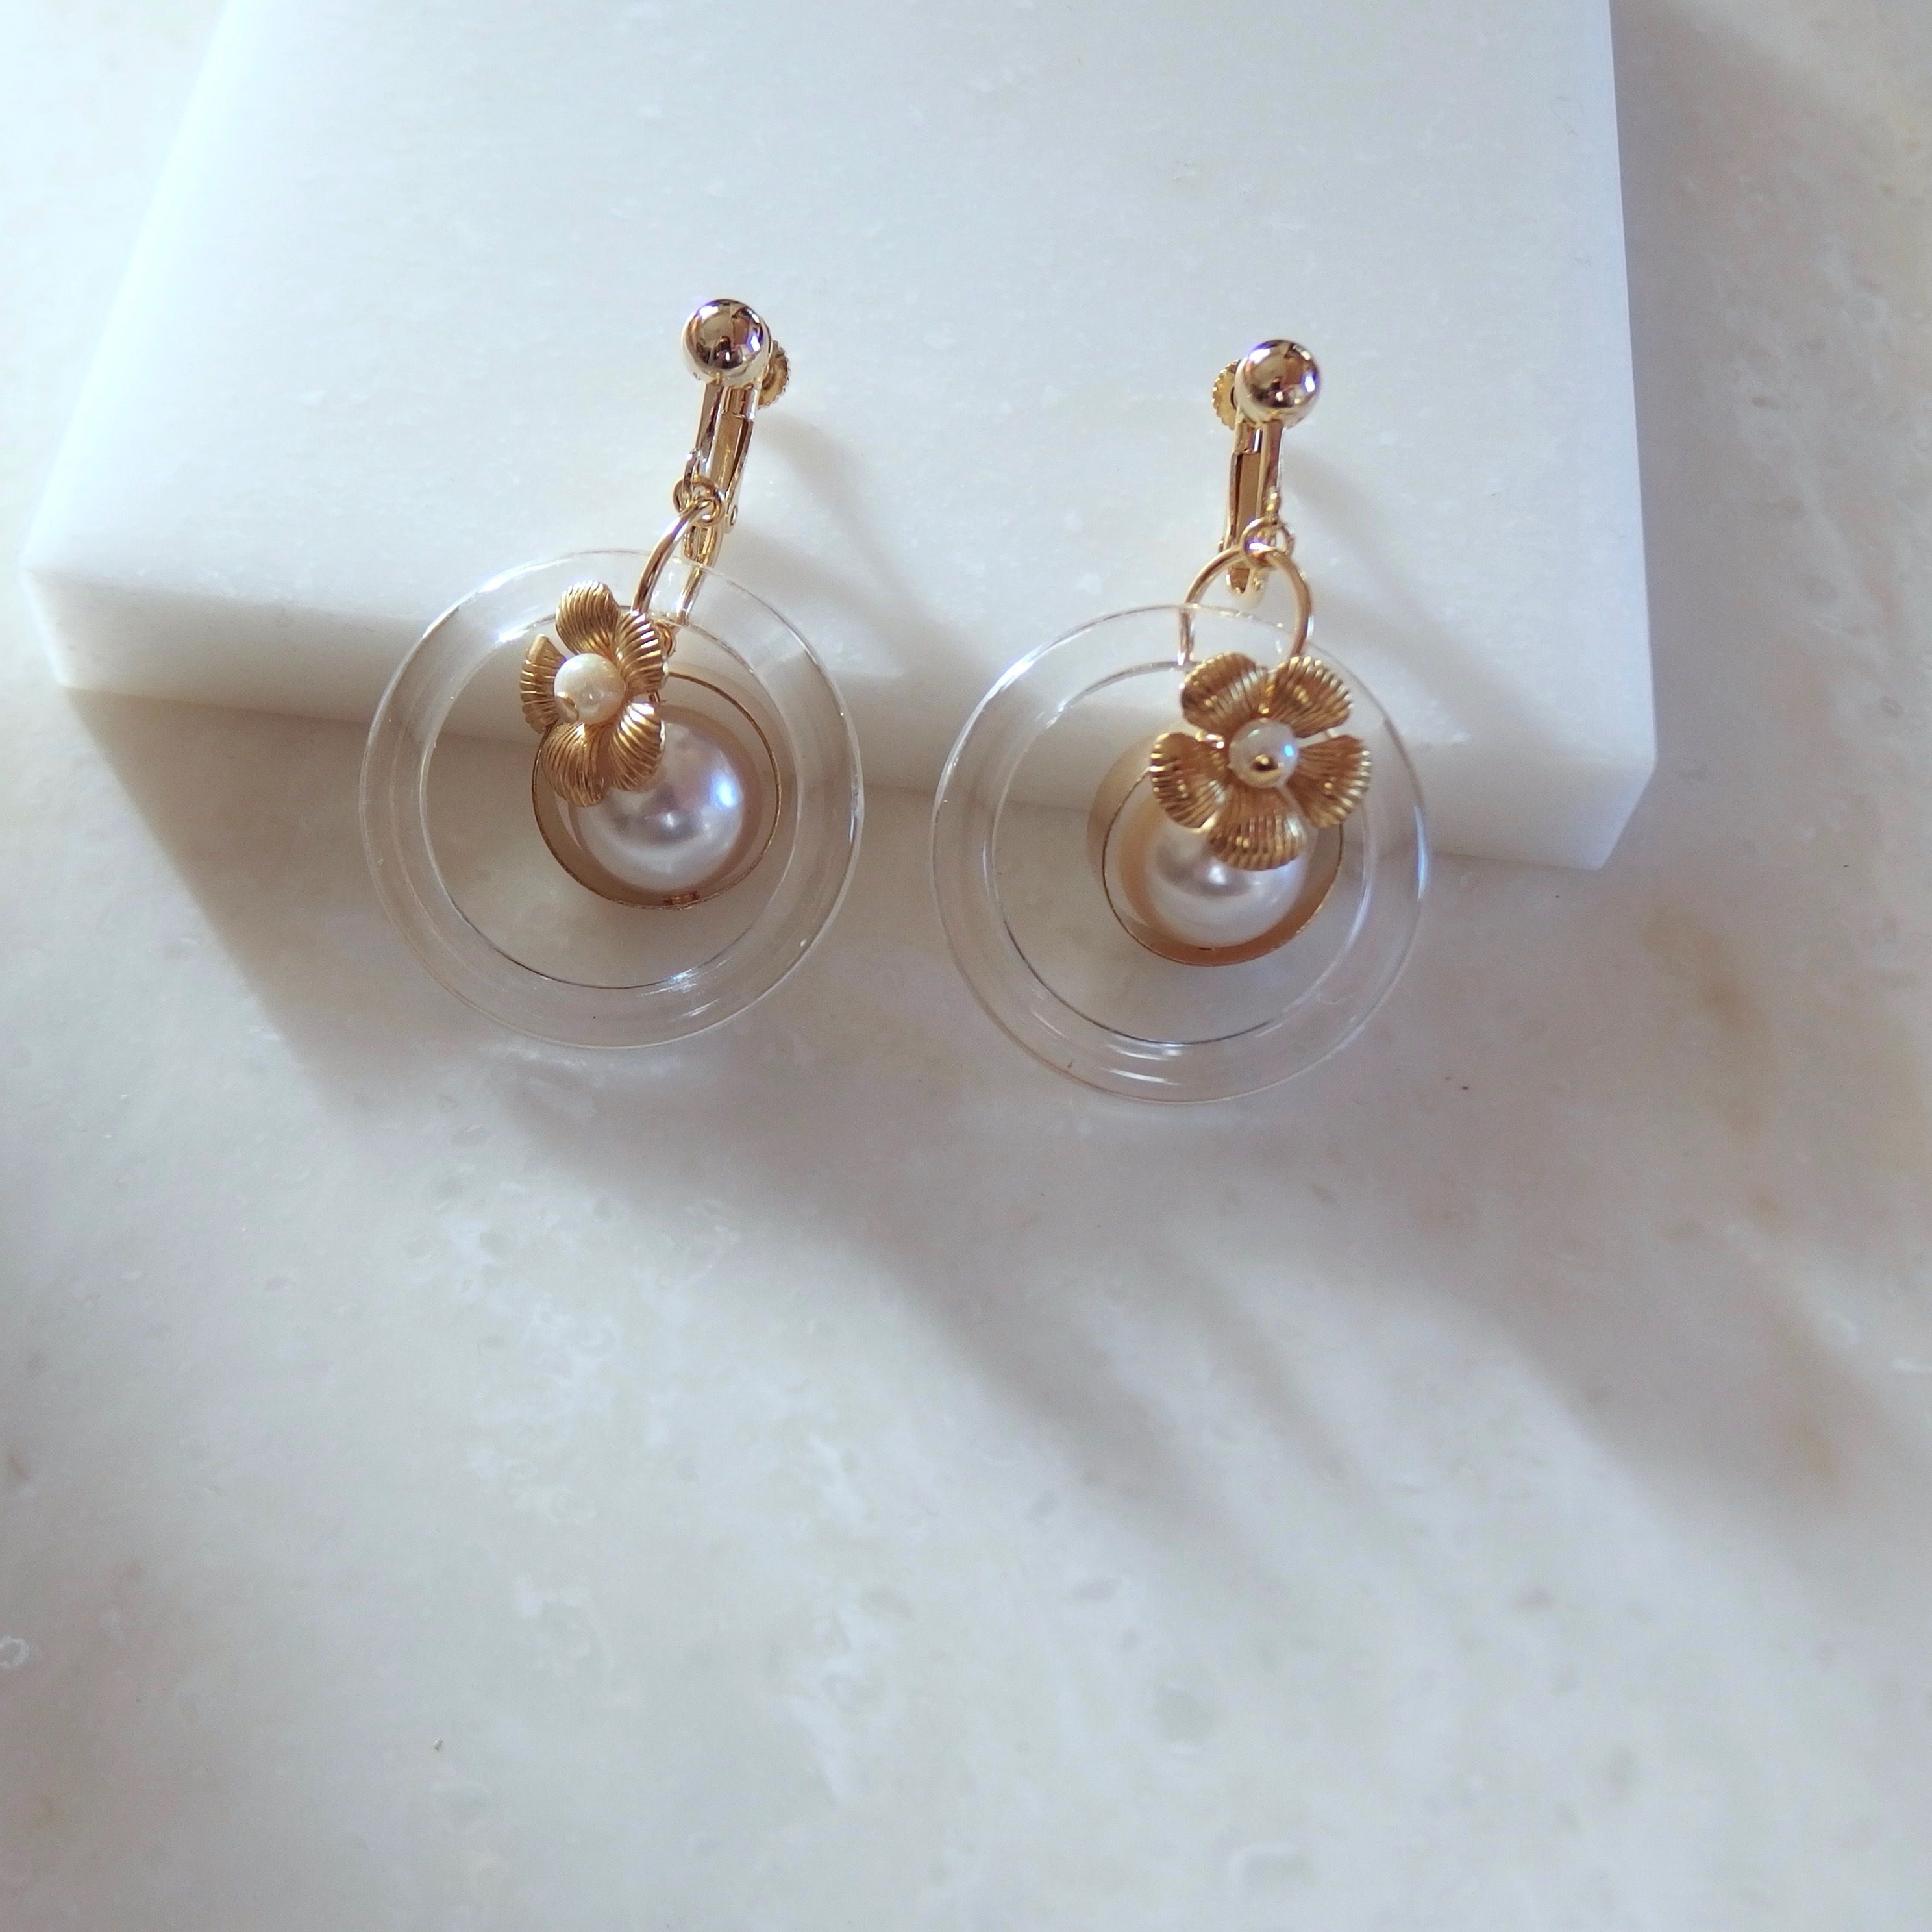 Flower Ring Earring (ピアス/チタンピアス変更可能)